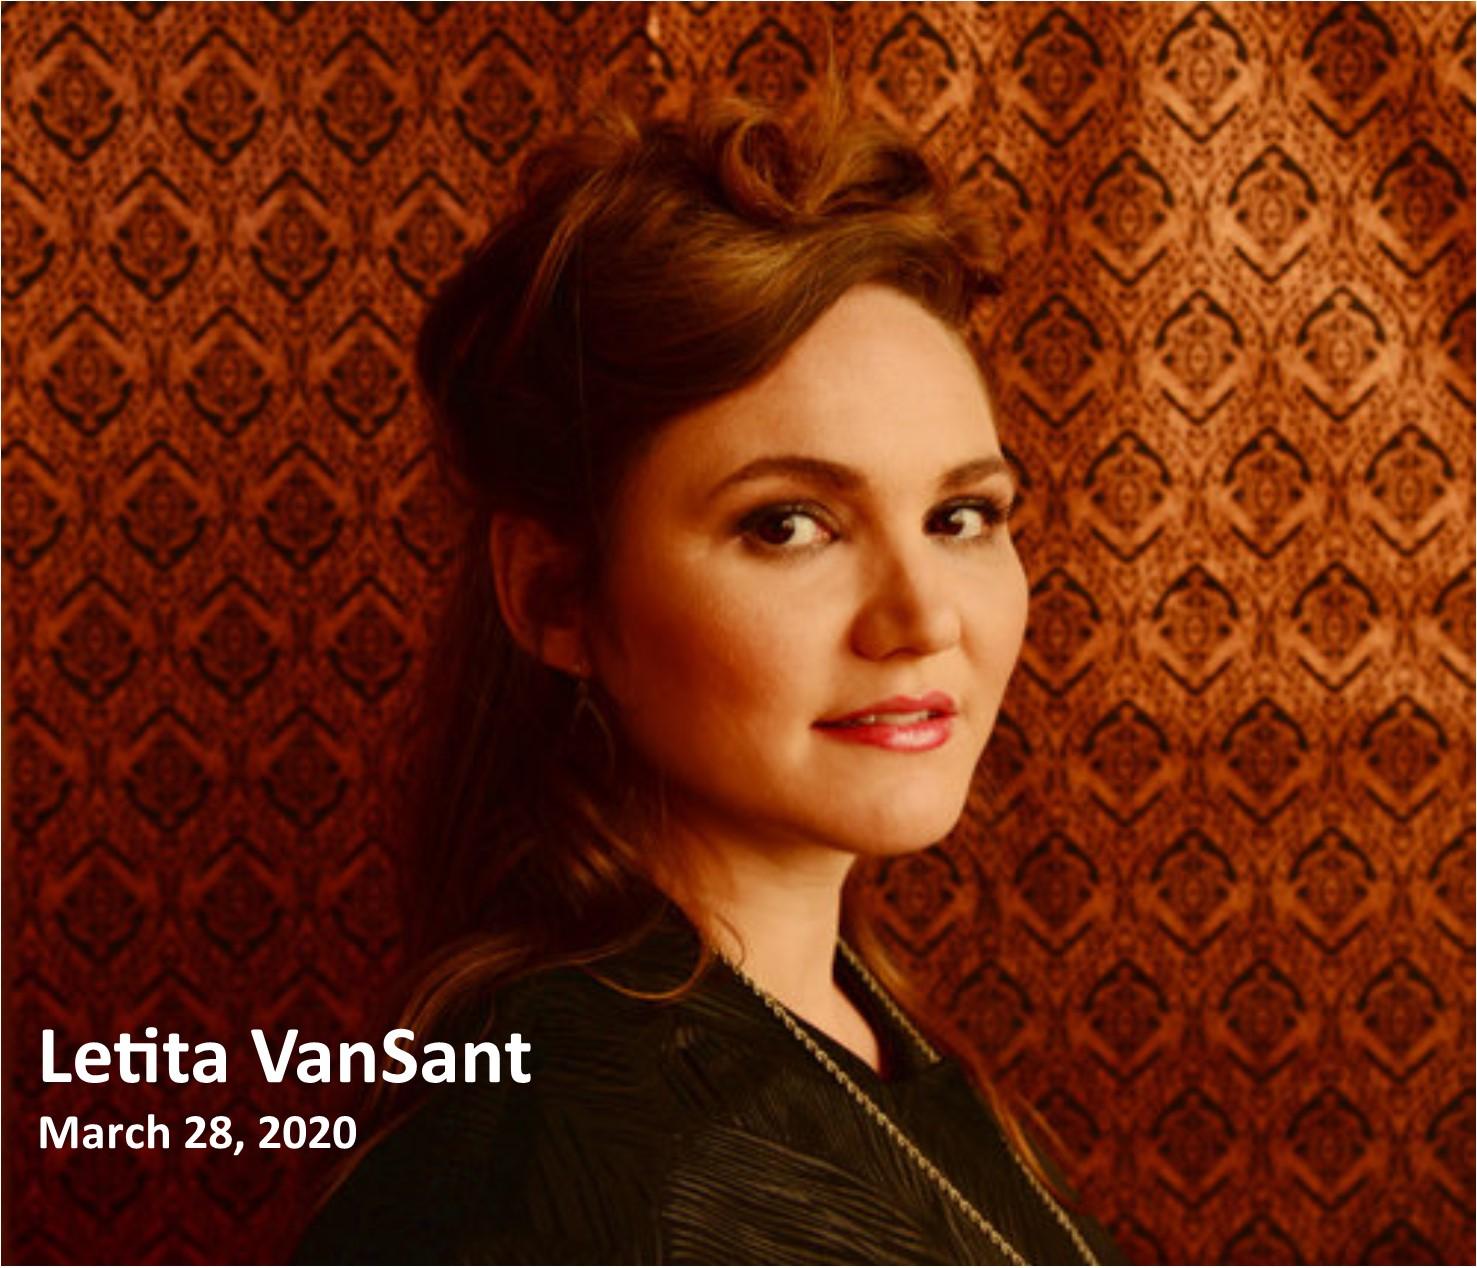 Letitia VanSant Carousel.jpg